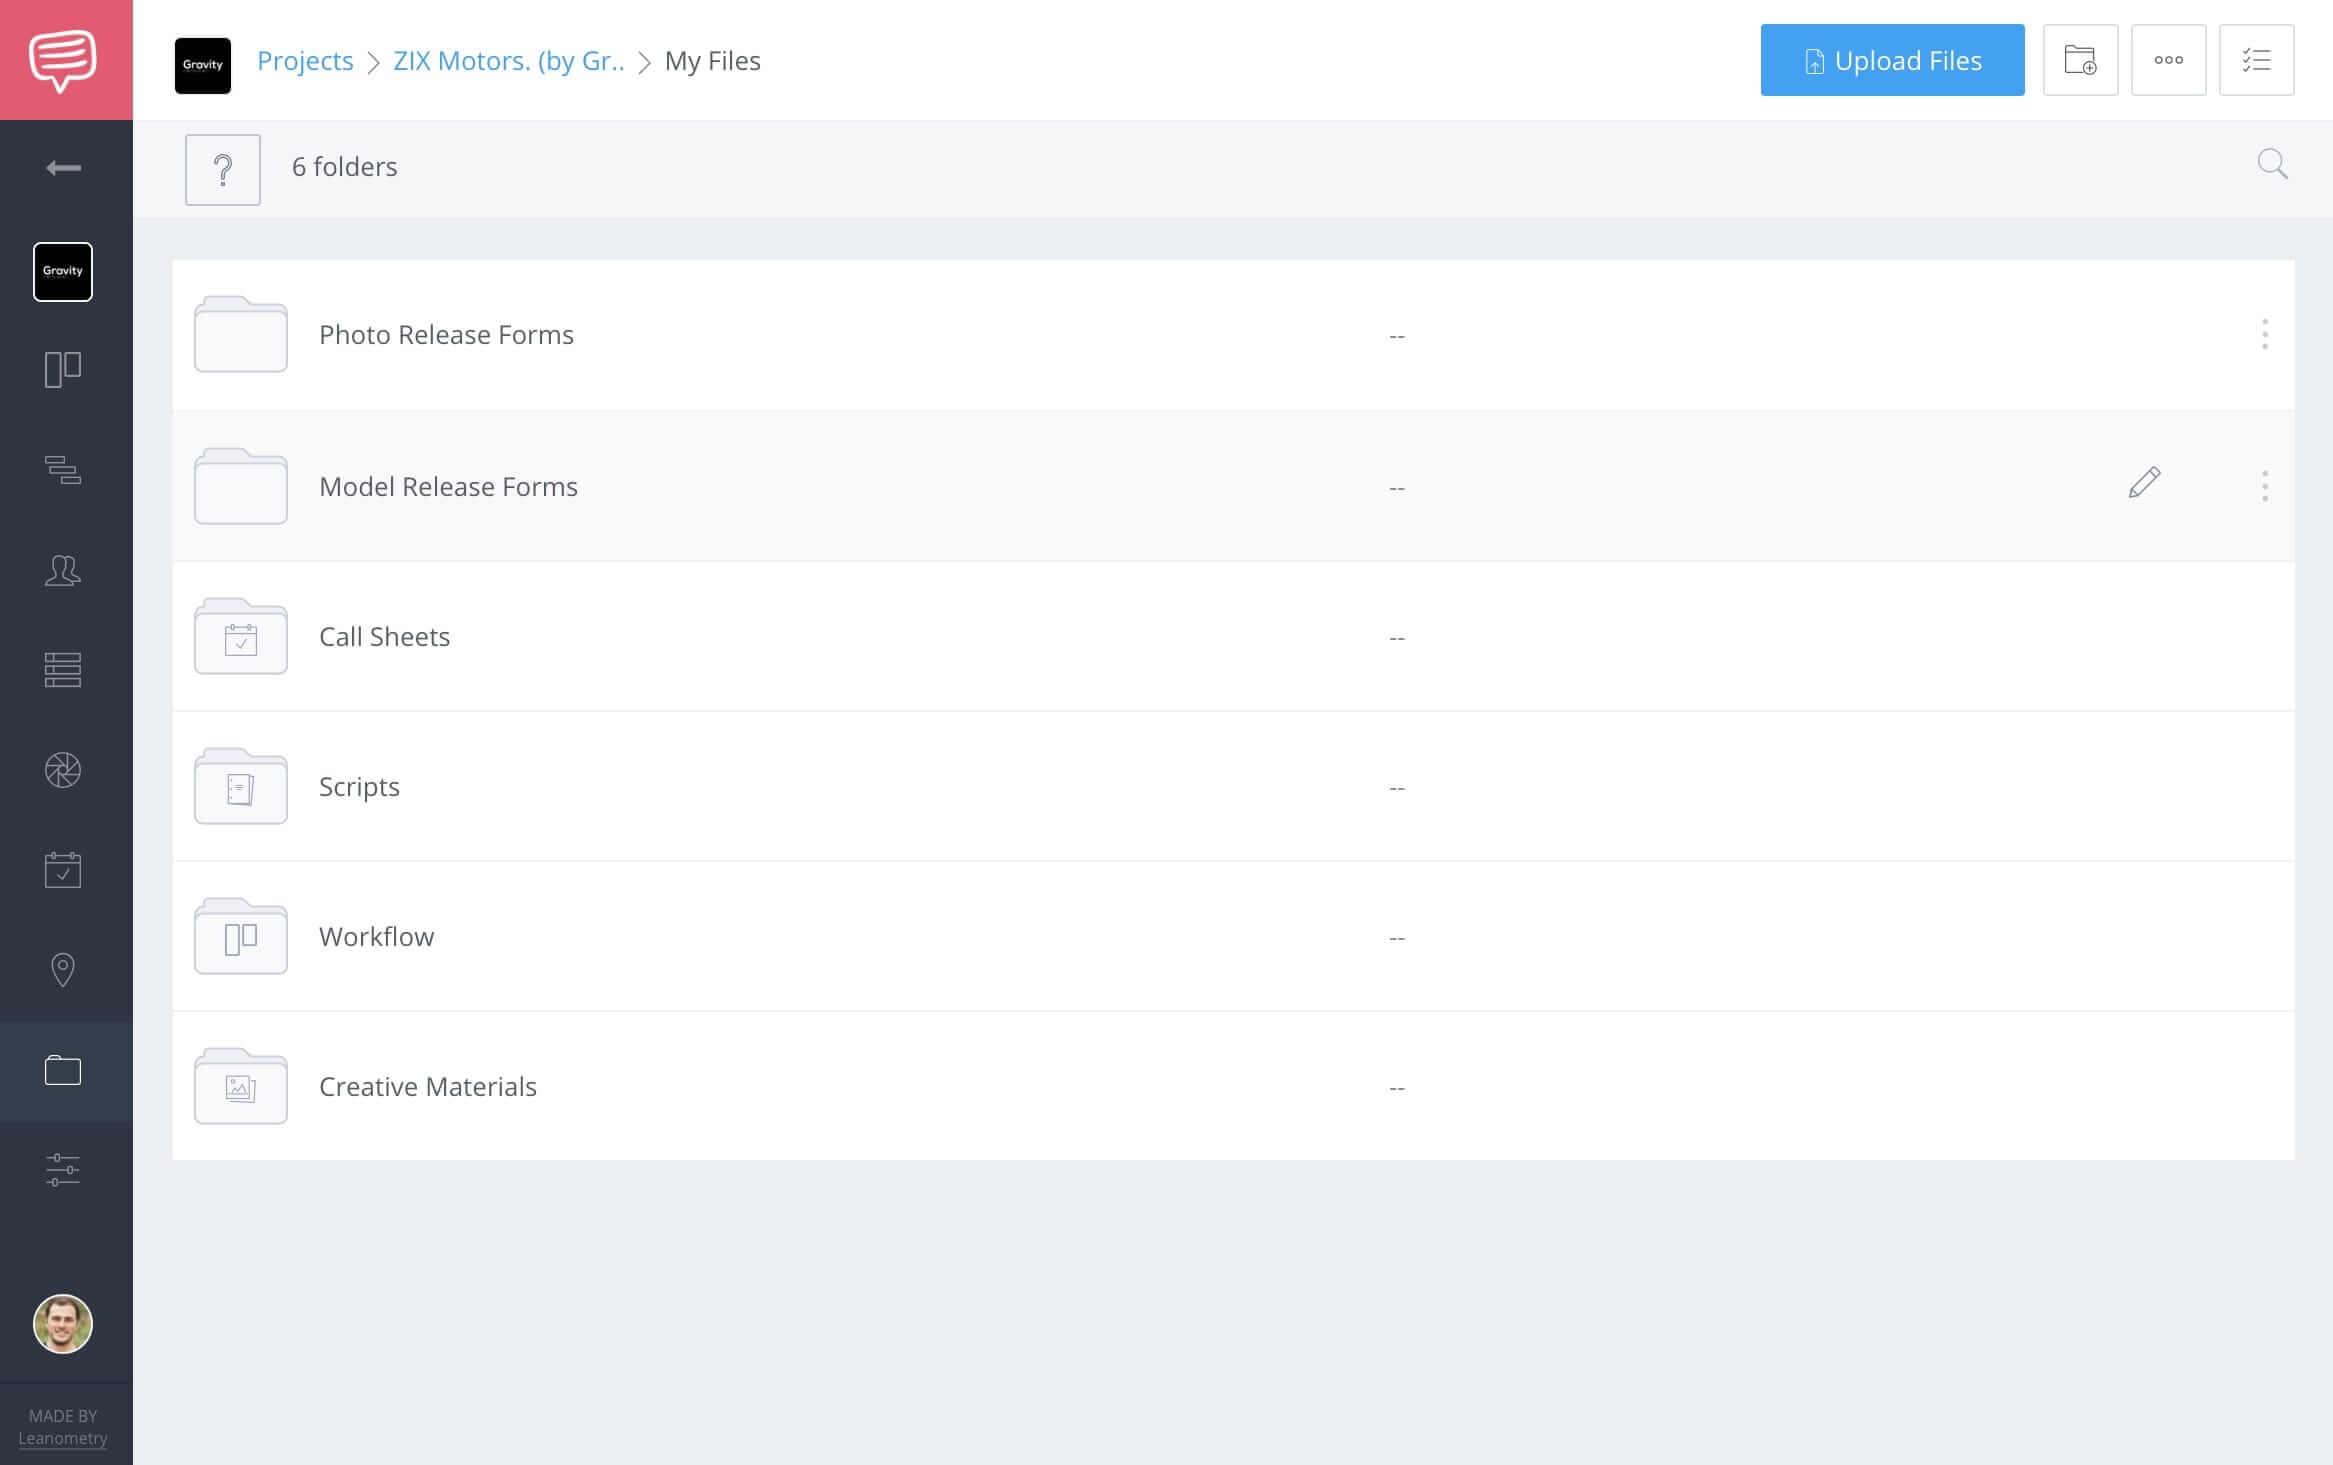 Model Release Form Template - Backup Files to StudioBinder